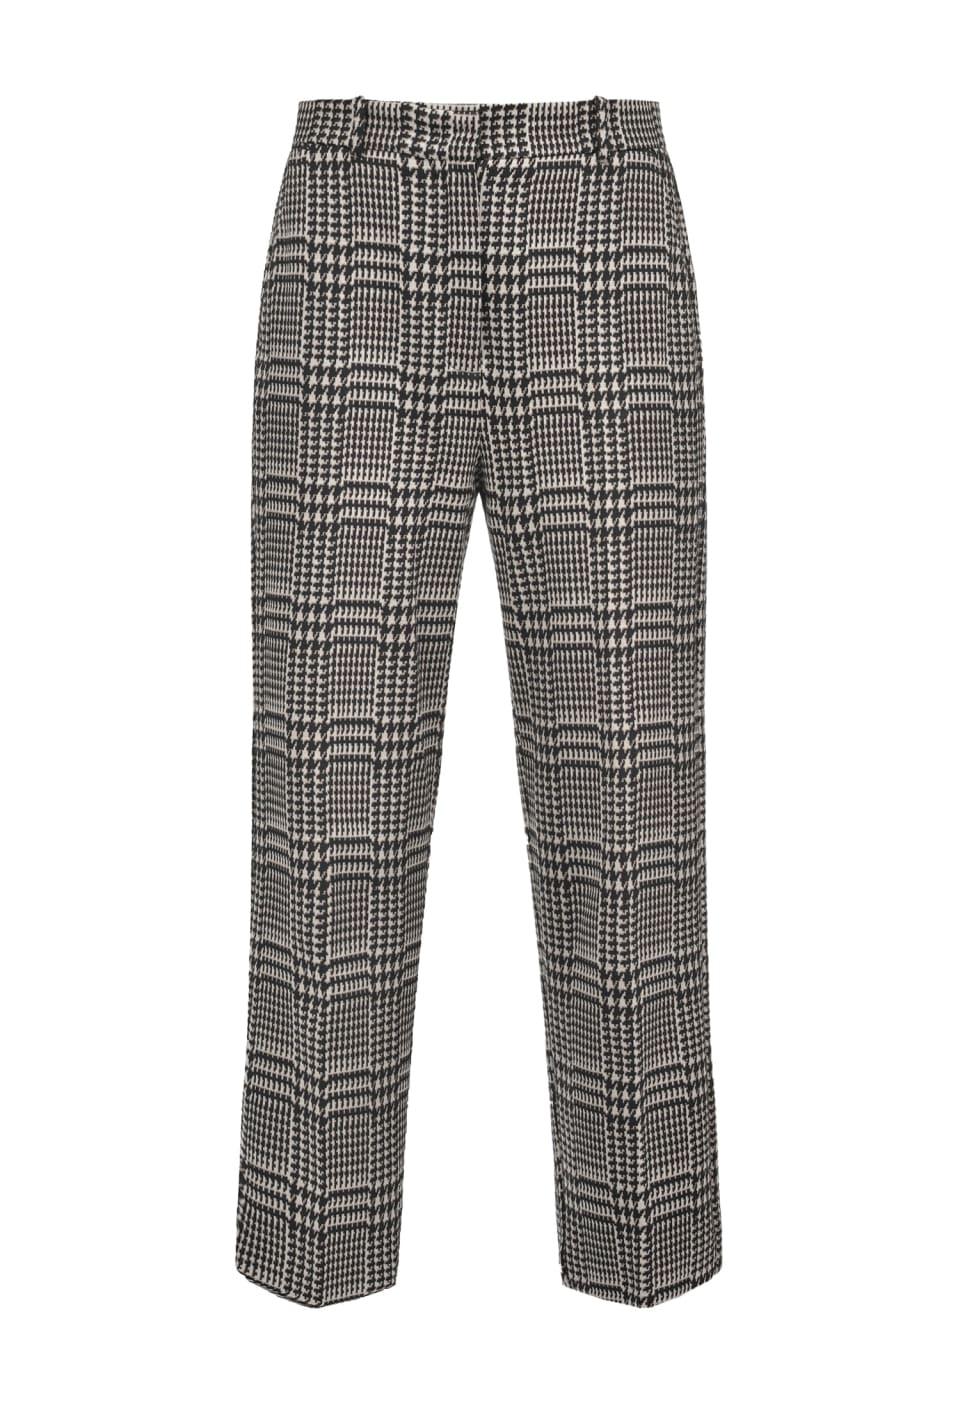 Straight Glen Plaid trousers - Pinko